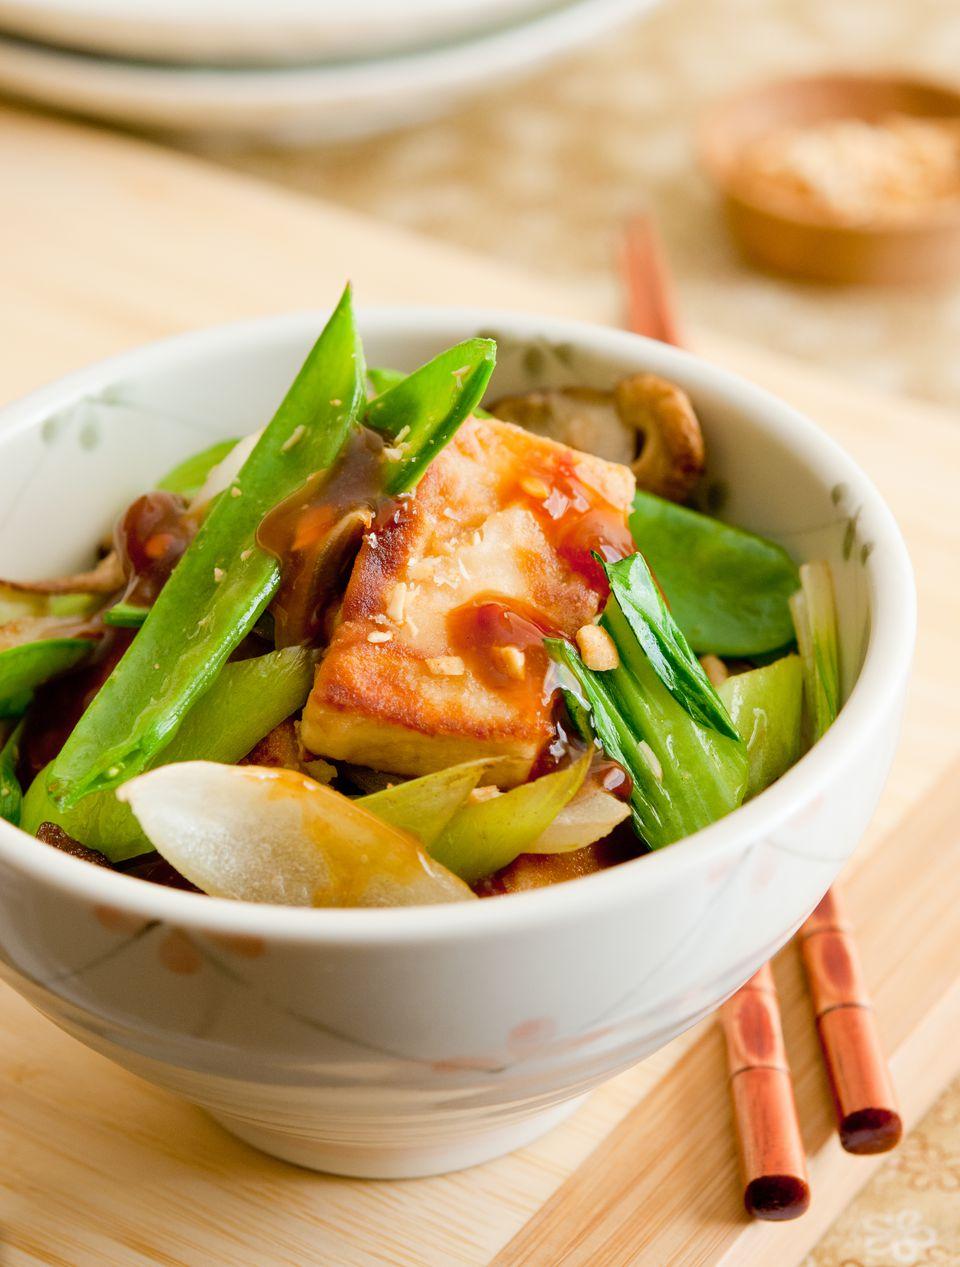 Vegetable stir fry with tofu and chopsticks